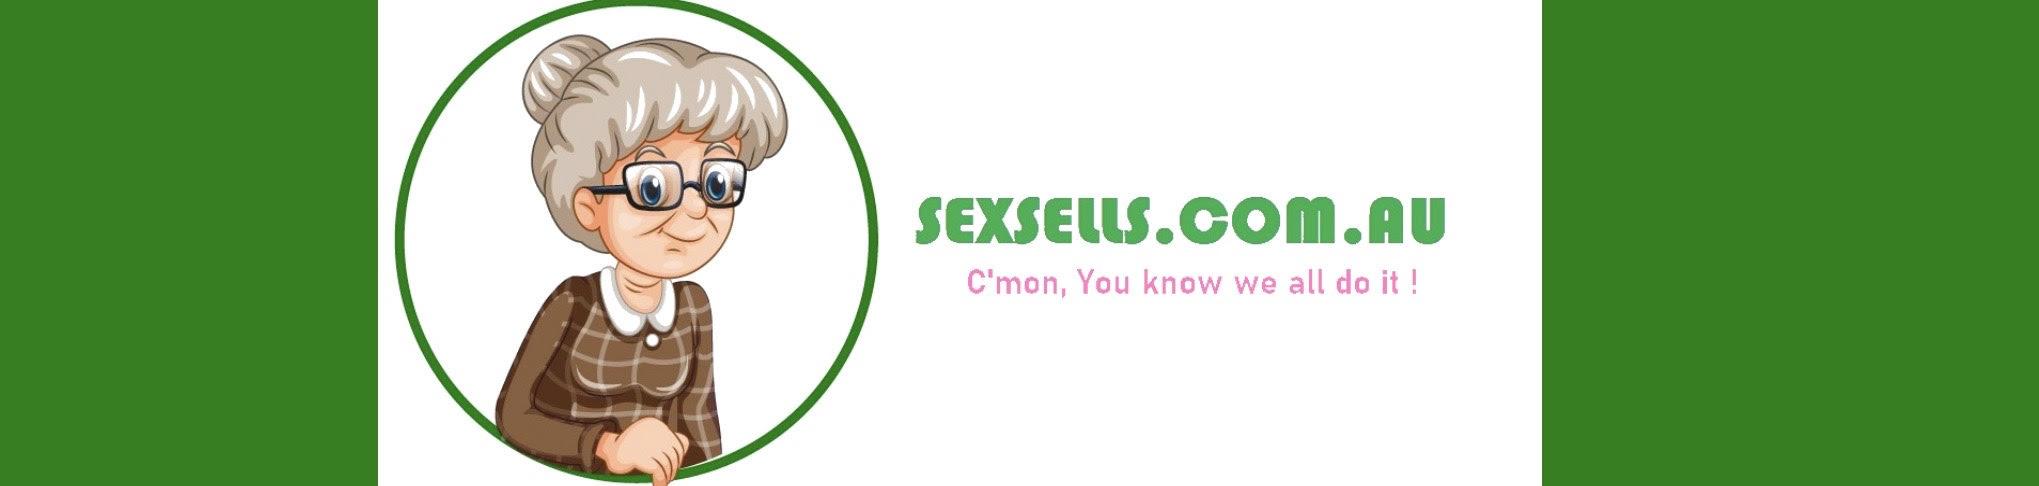 SexSells2